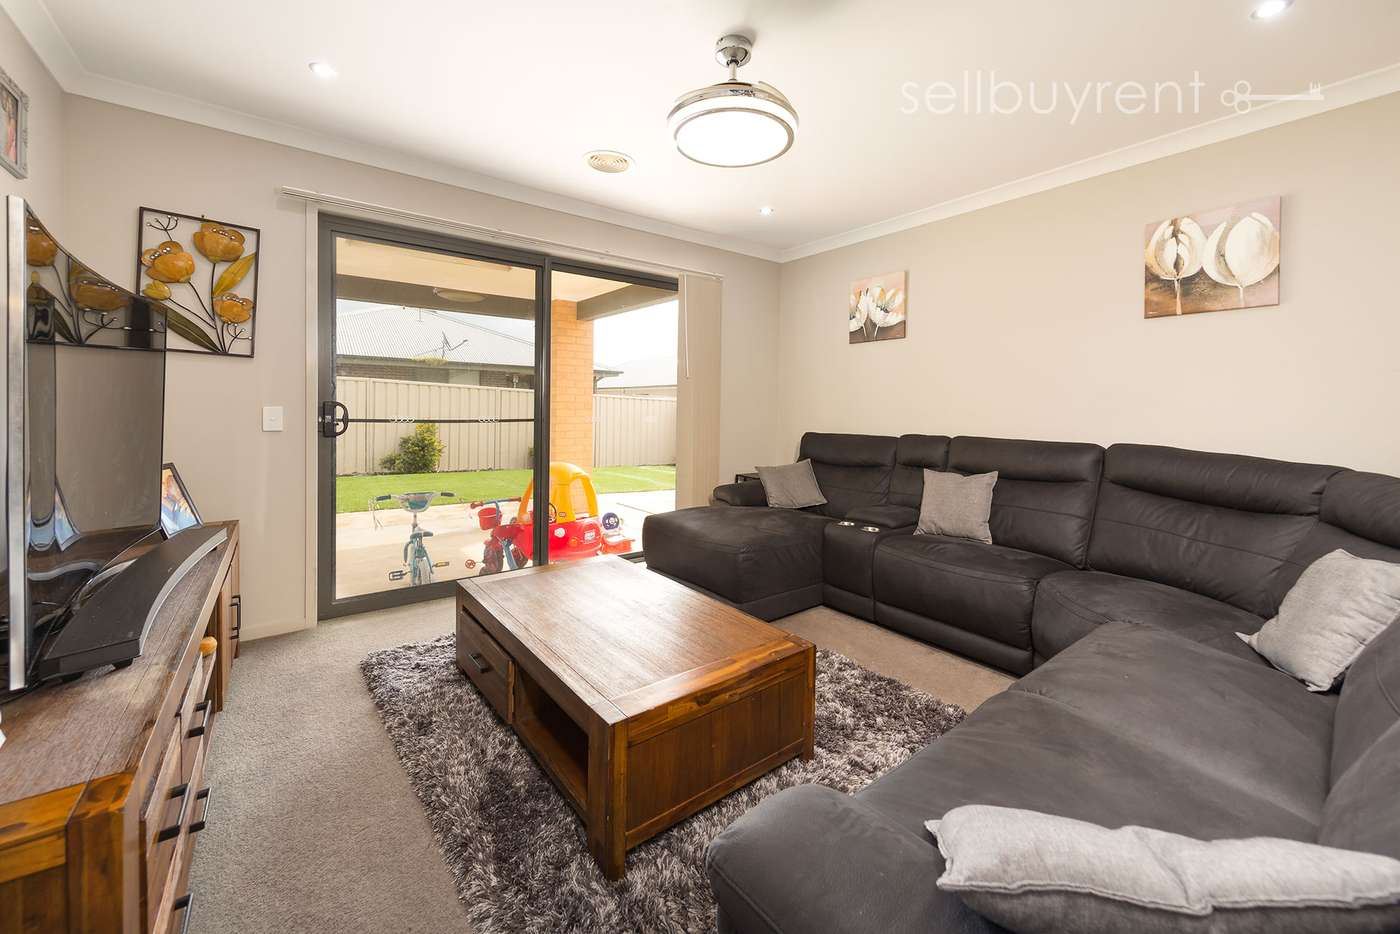 Sixth view of Homely house listing, 19 BUGDEN STREET, Wodonga VIC 3690